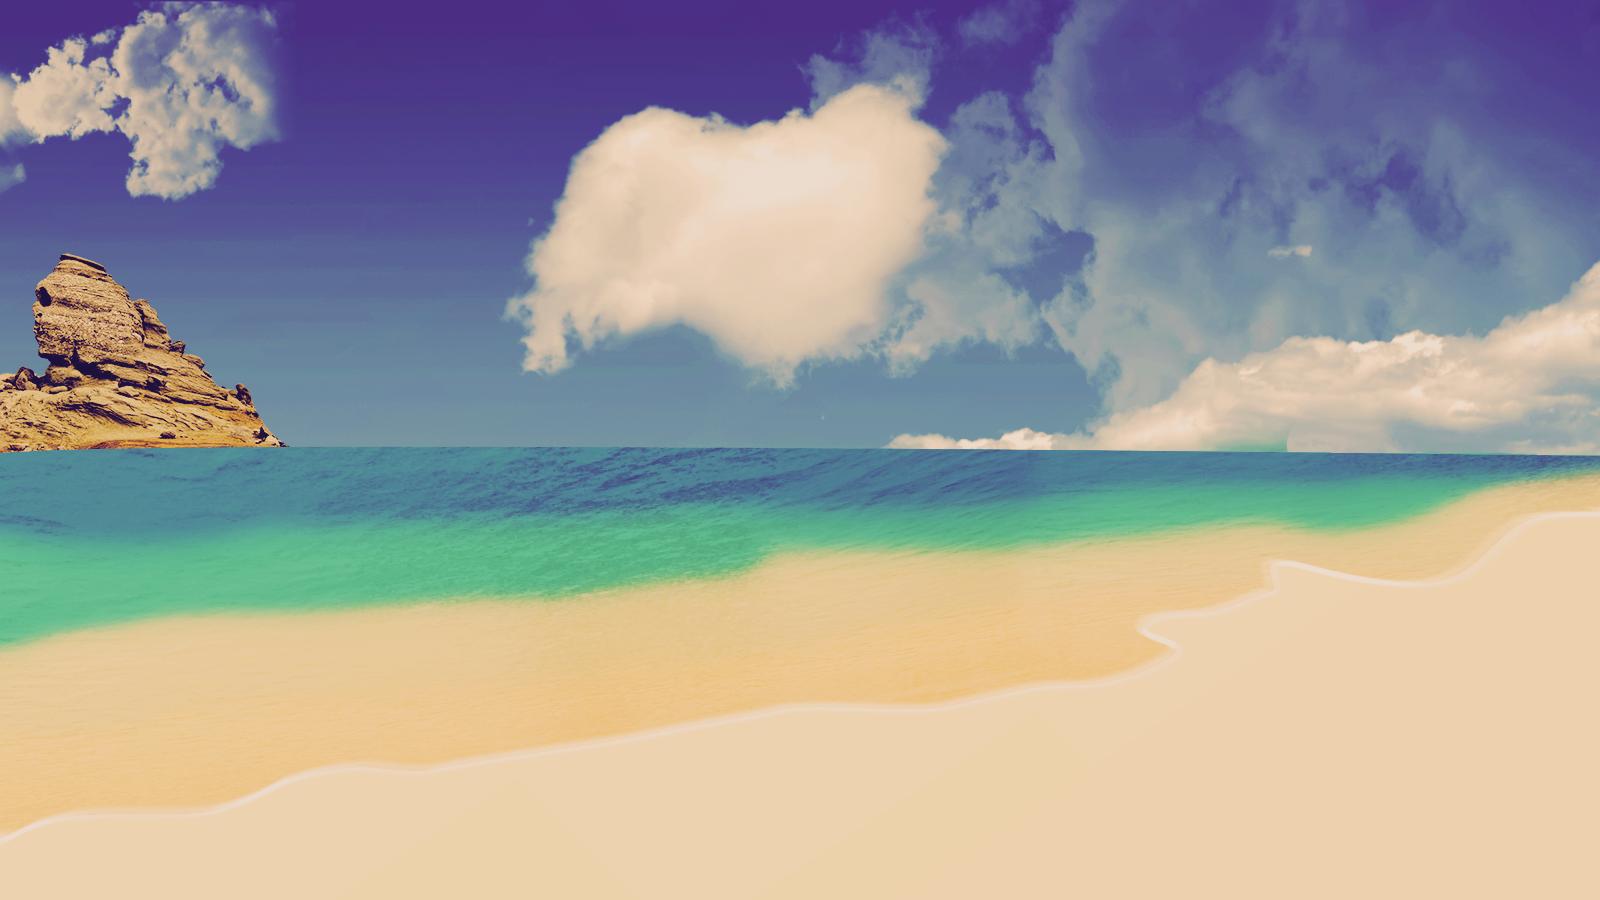 Tumblr Summer 1600x900